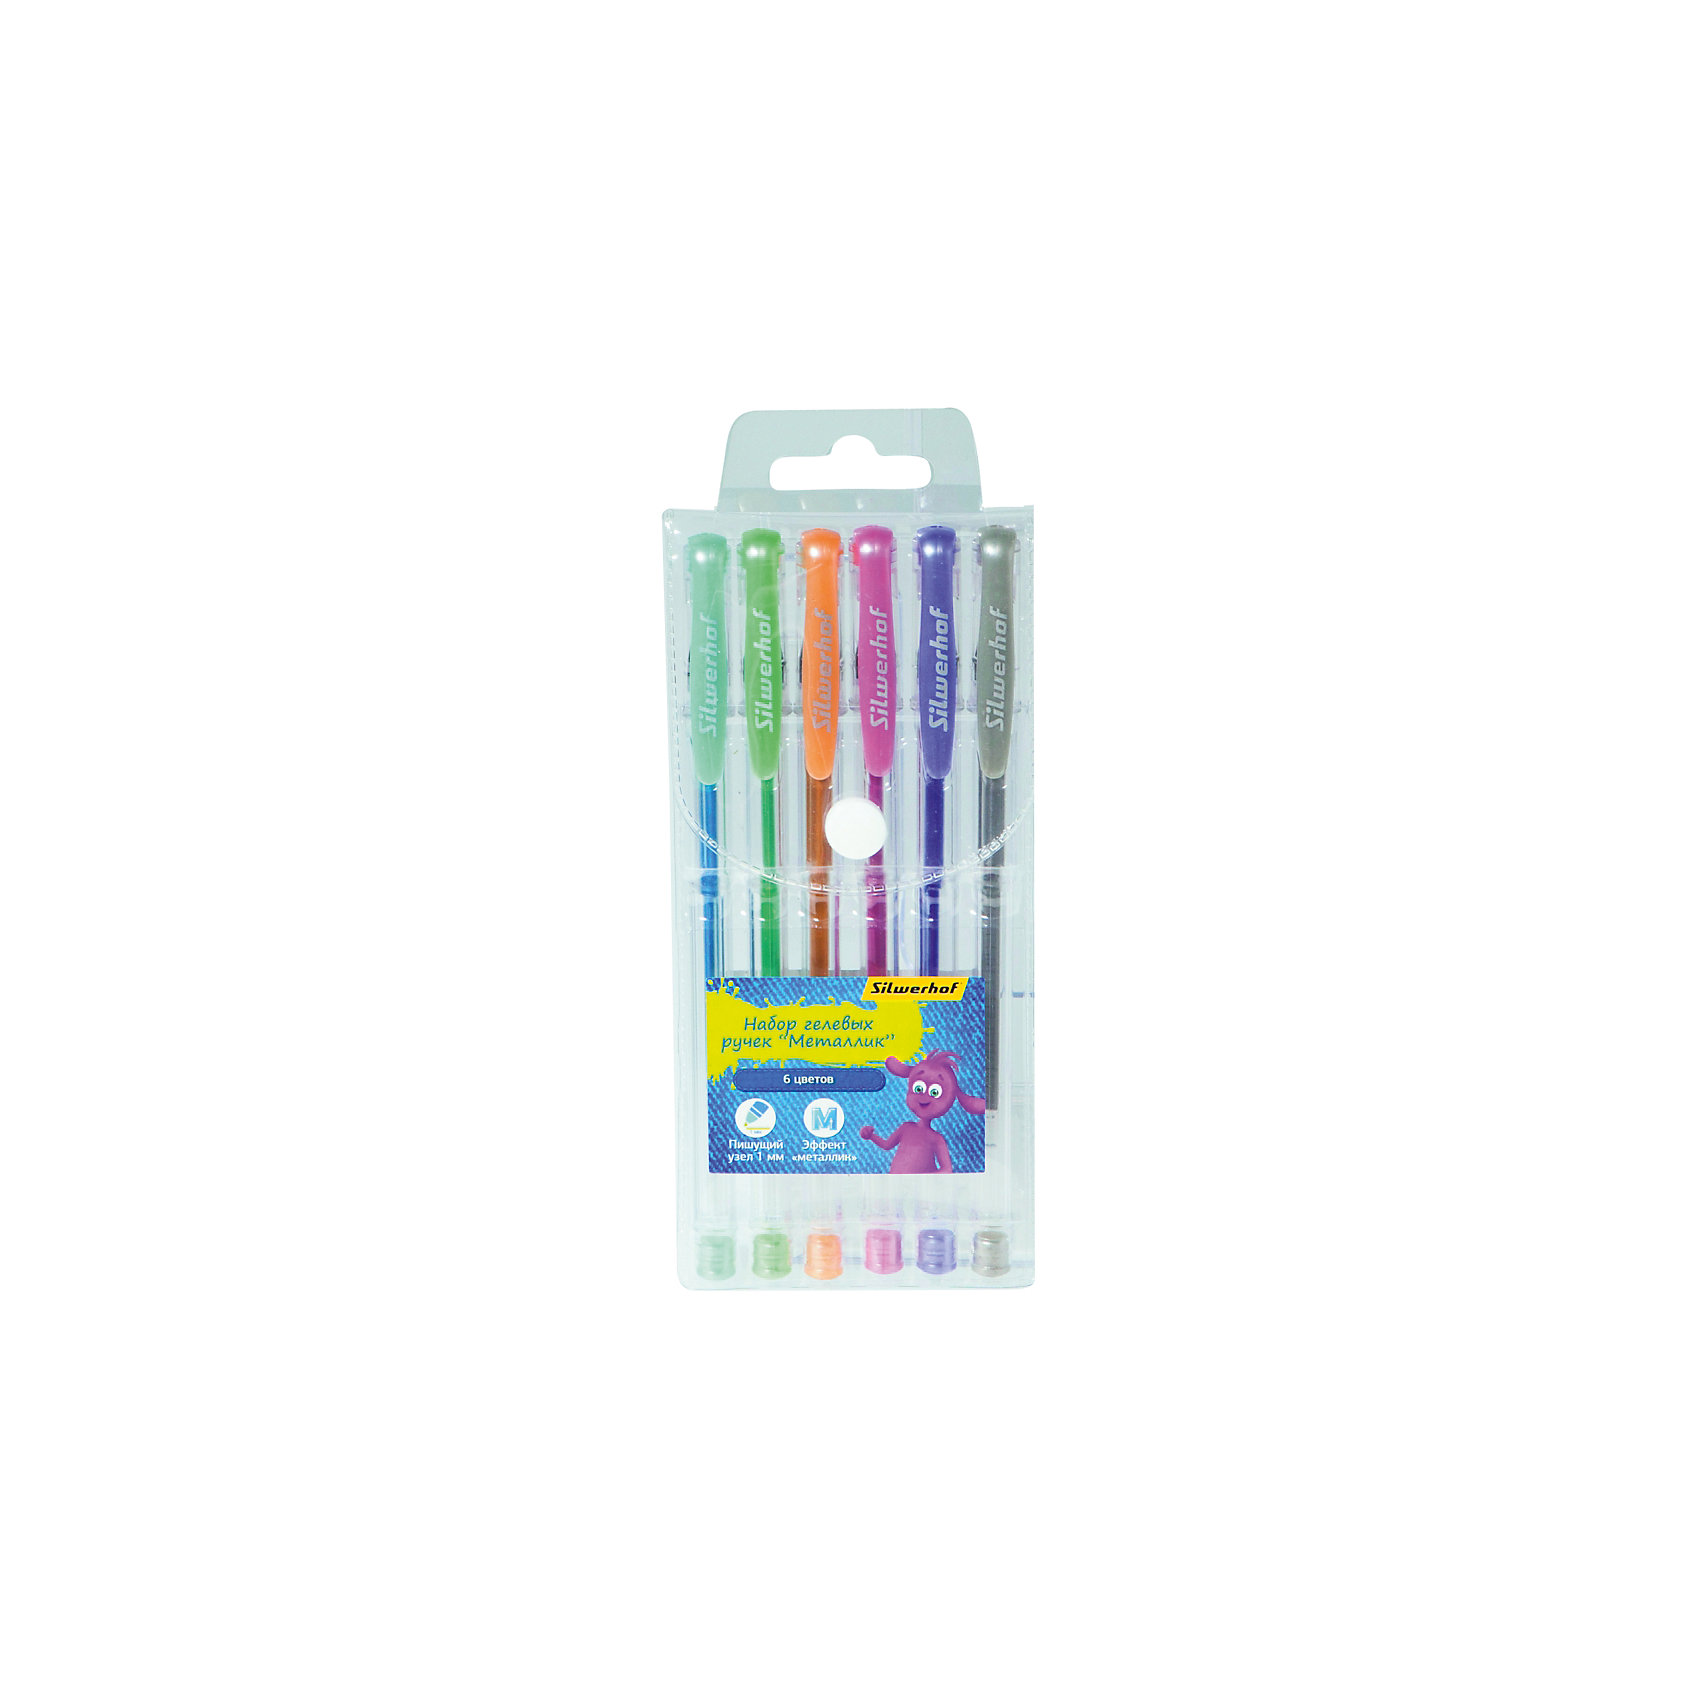 Silwerhof Ручка гелевая, набор 6шт, ДЖИНСОВАЯ КОЛЛЕКЦИЯ набор для рисования silwerhof 867214 джинсовая коллекция 32 предмета картон кор